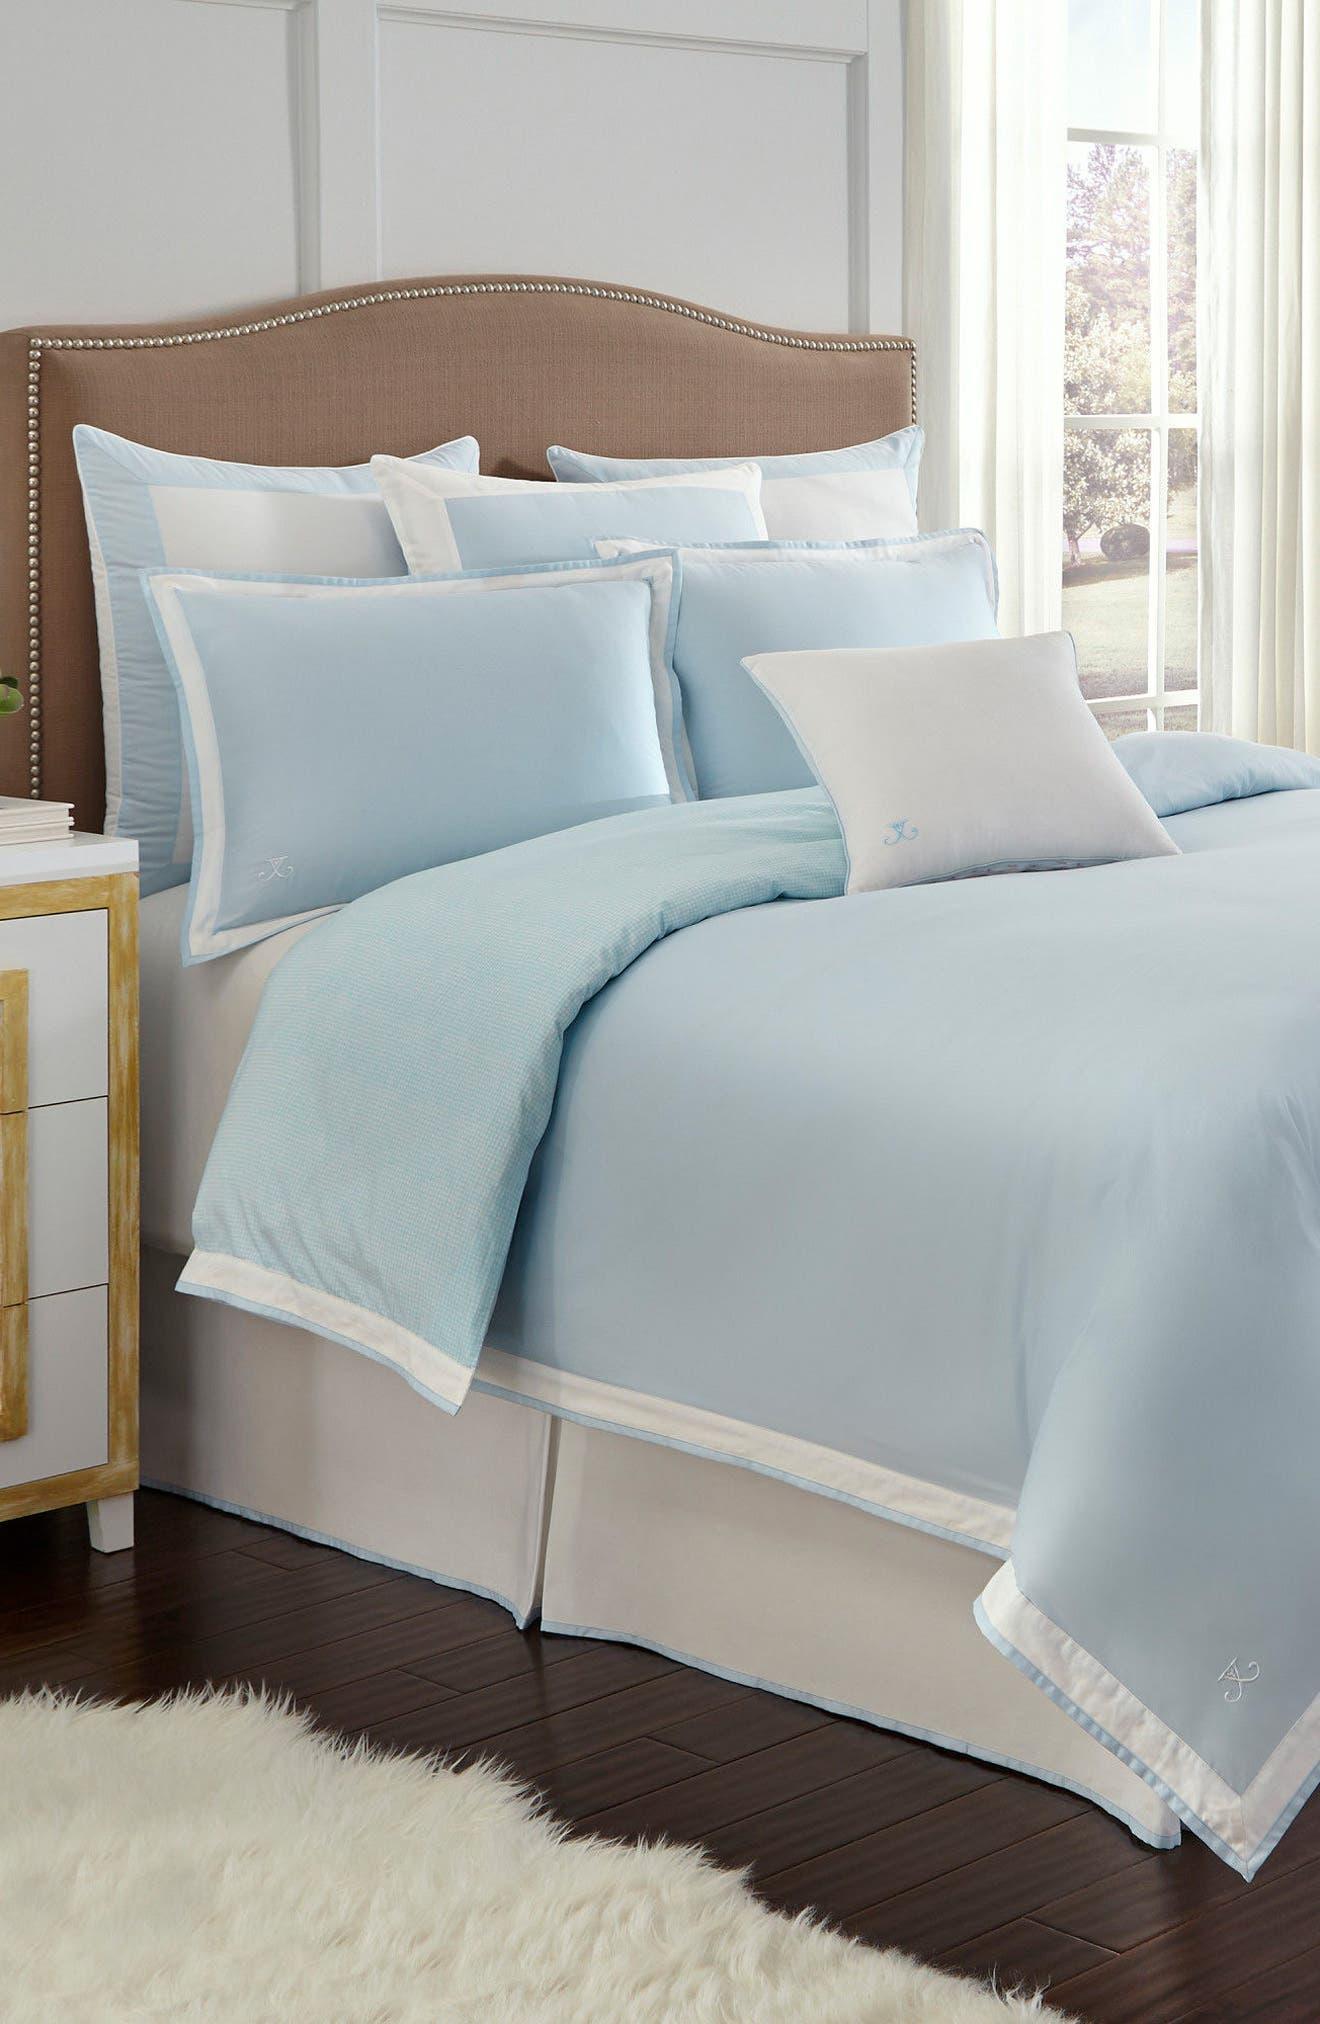 Sugarhouse Comforter,                         Main,                         color, 400